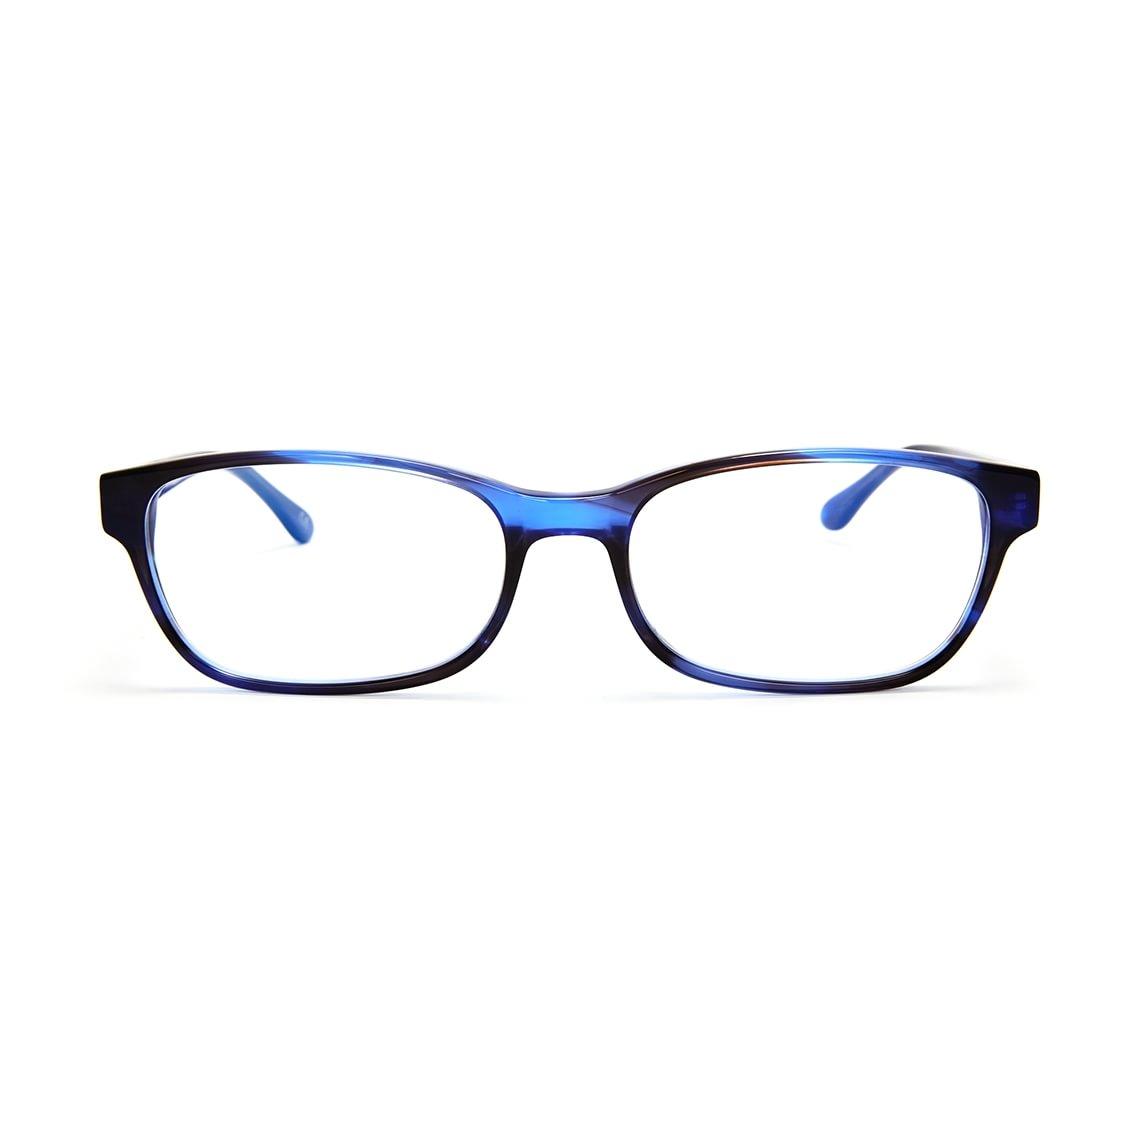 EOE EYEWEAR Lappspira Blueberry 5517